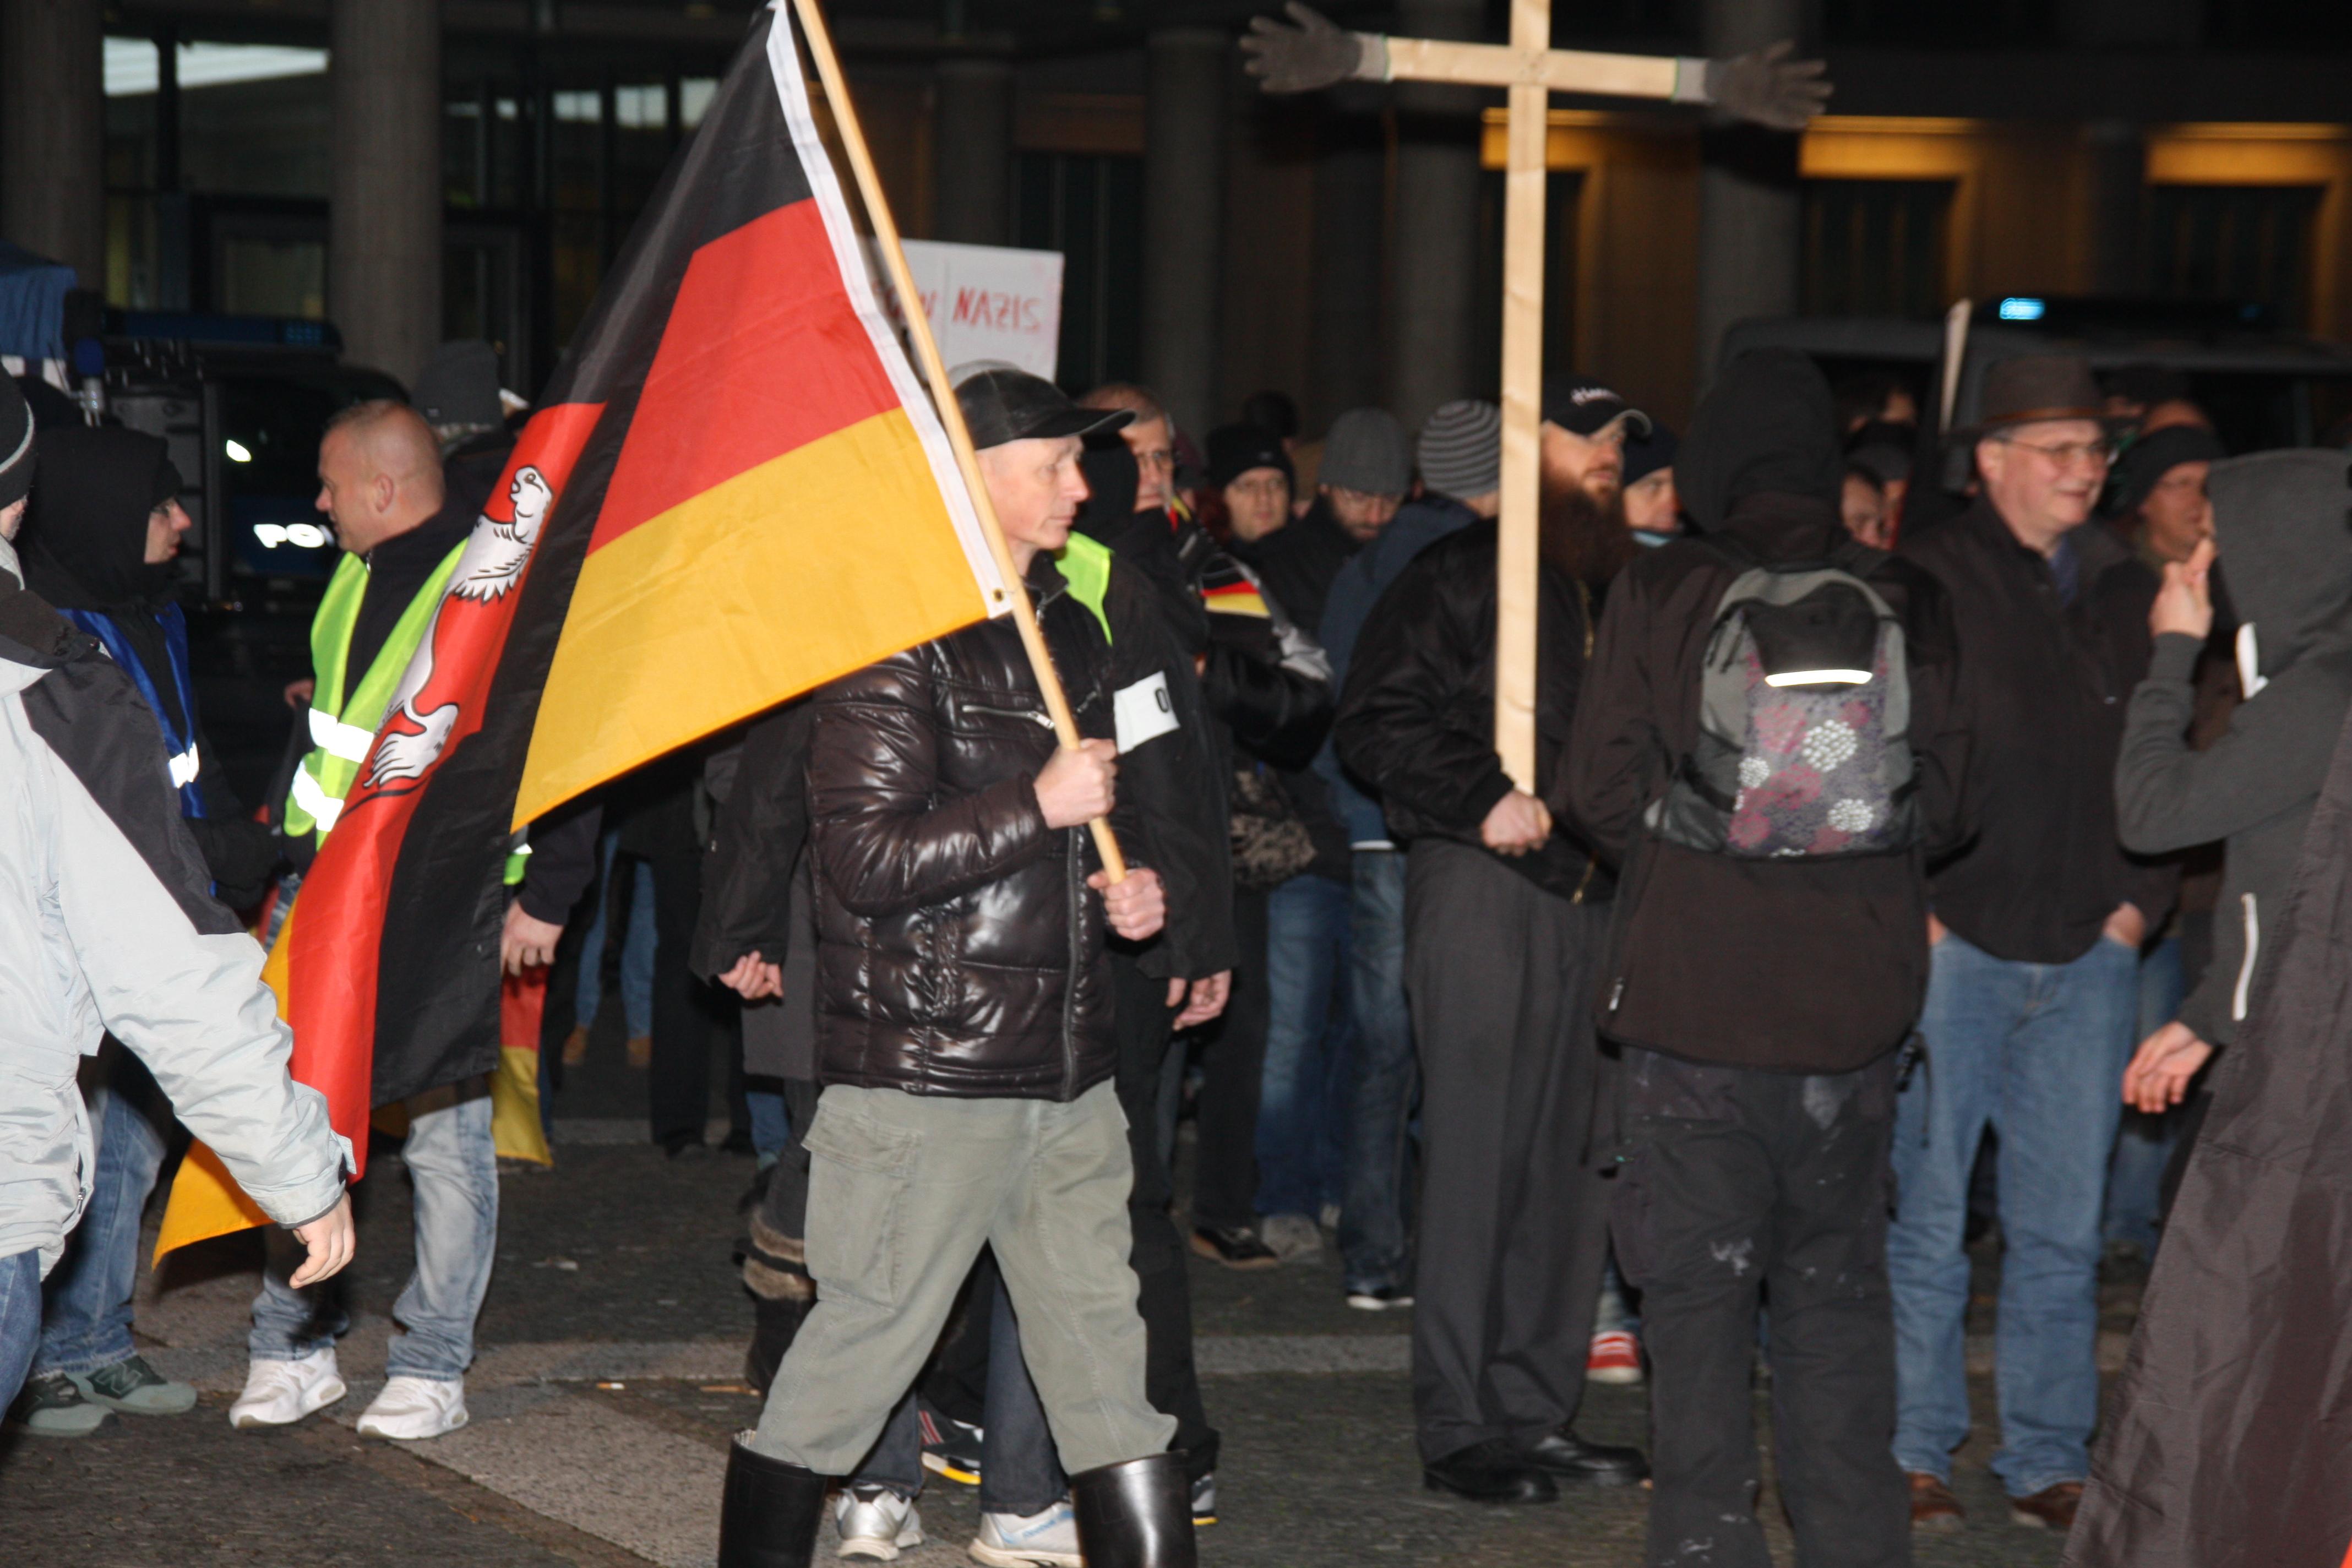 Henning B. auf der Pegida Hannover Demonstration am 14.12.2015